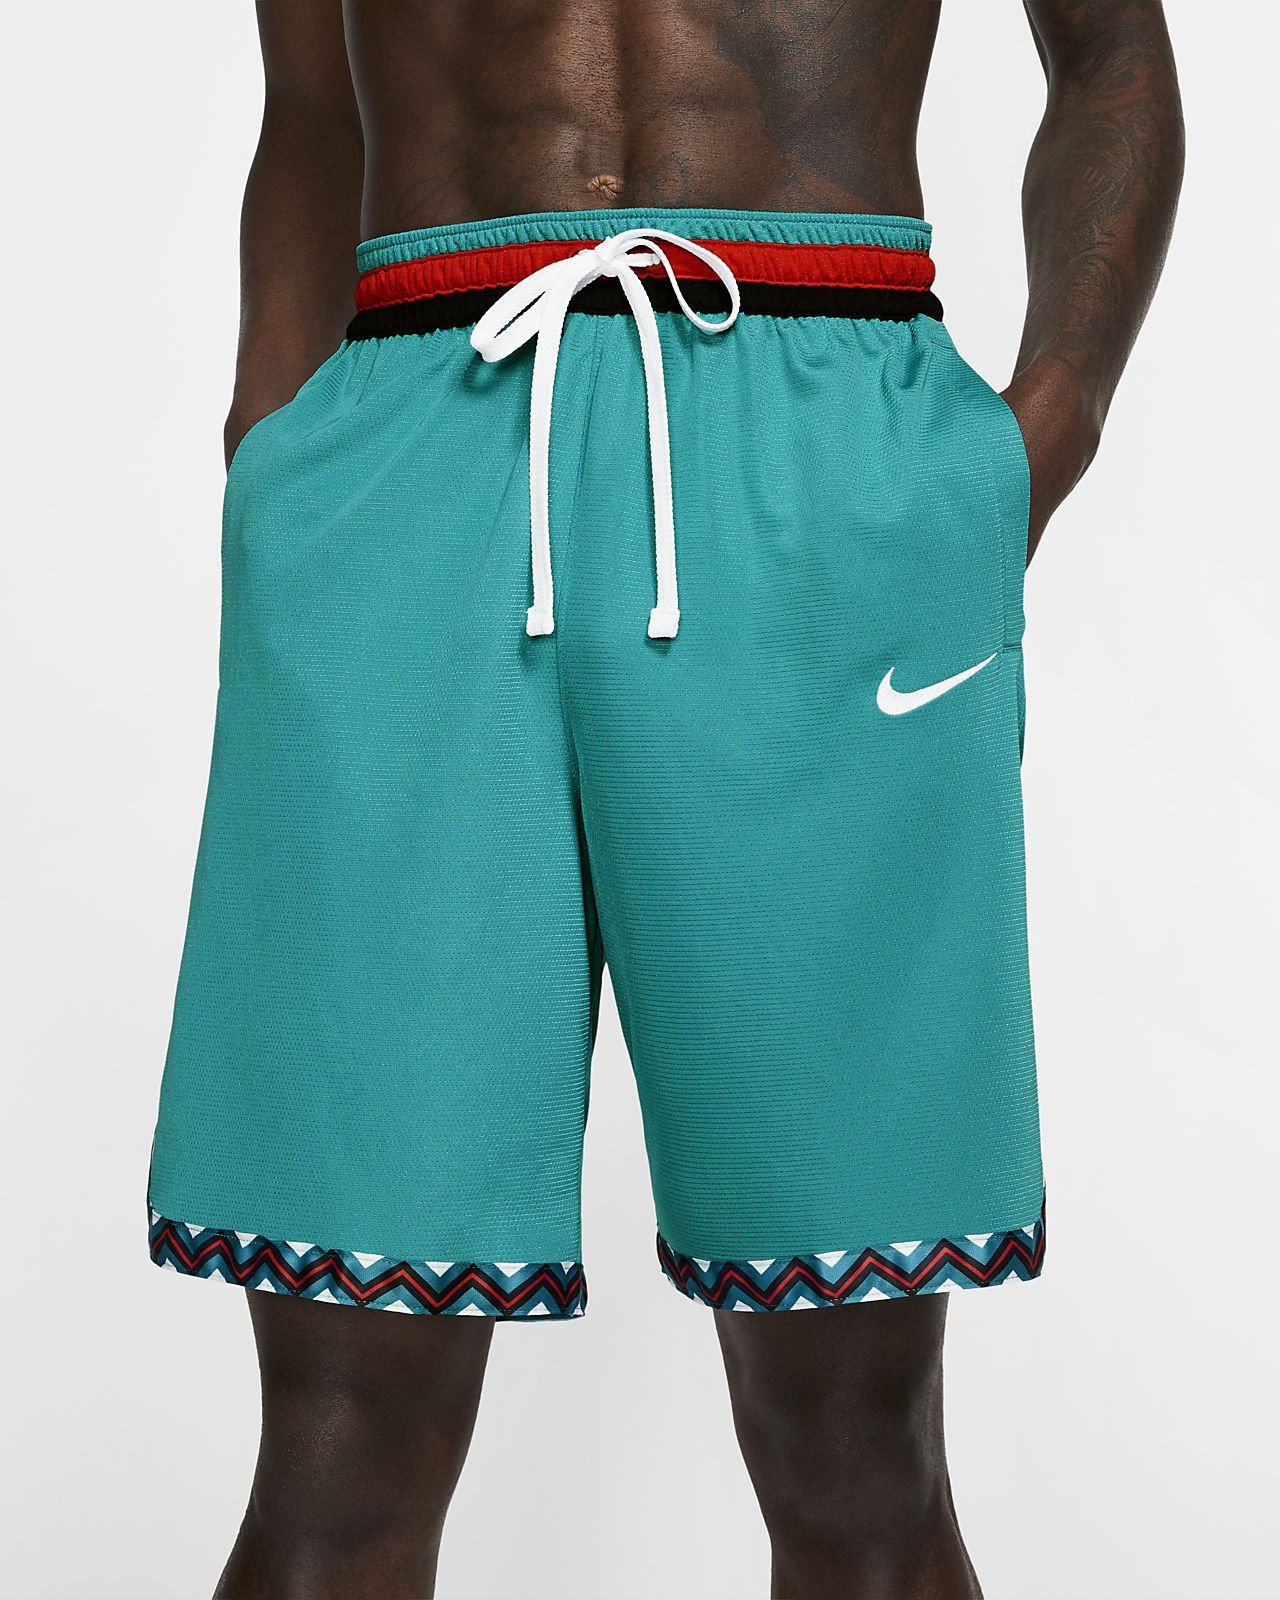 7d4e64d80934f Nike Dri-FIT DNA Men's Basketball Shorts. Nike.com CA